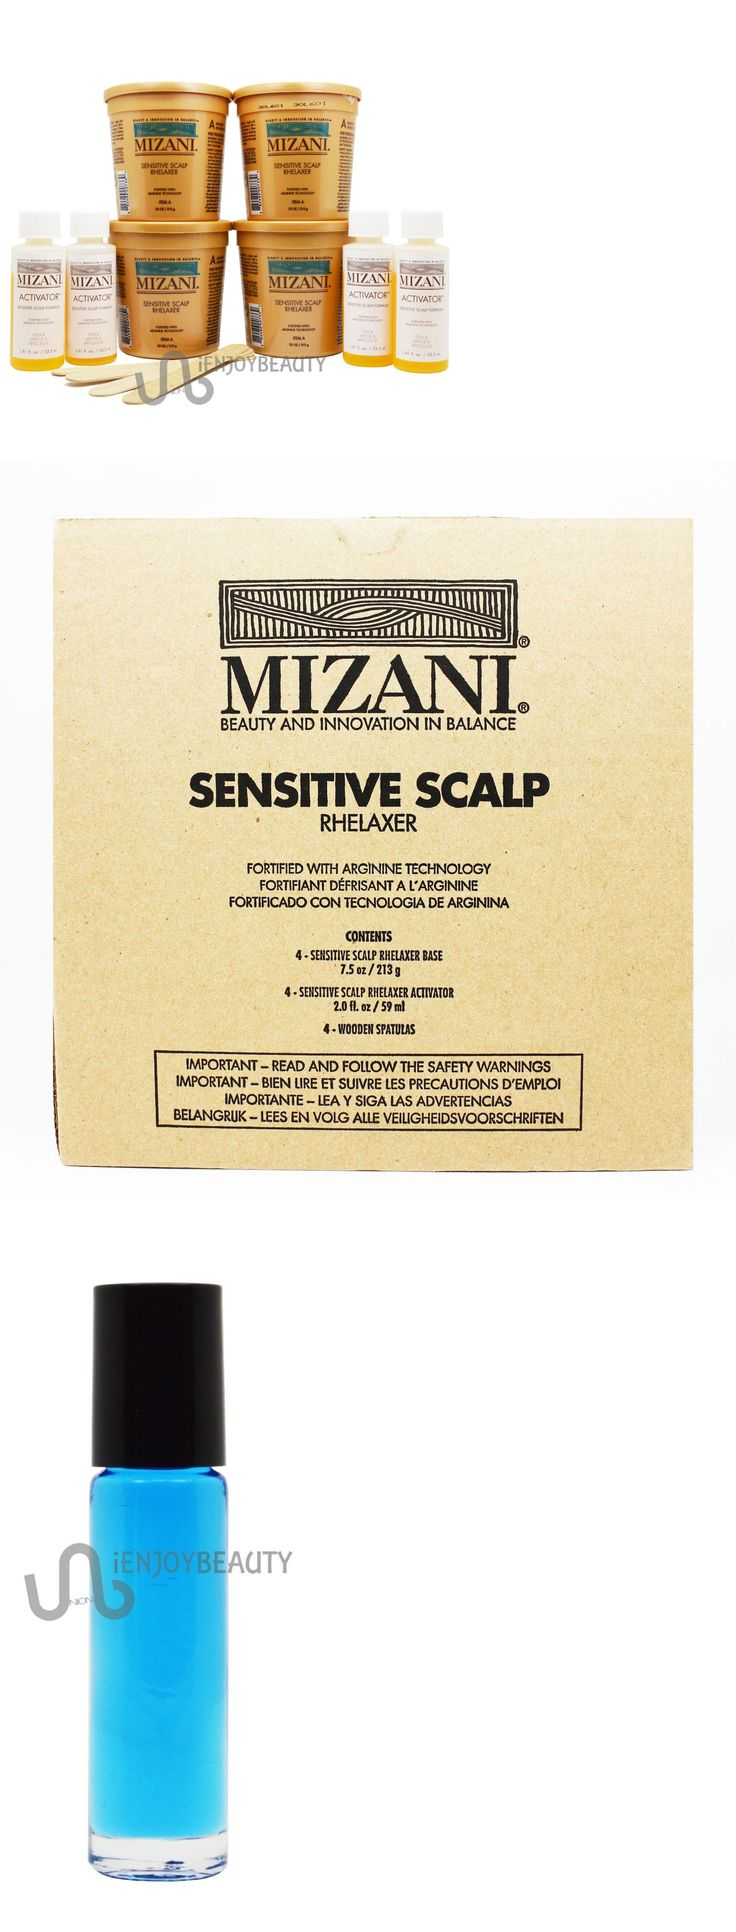 Sets and Kits: Mizani Sensitive Scalp Relaxer 4 Application Kit W Free Body Oil -> BUY IT NOW ONLY: $31.99 on eBay!